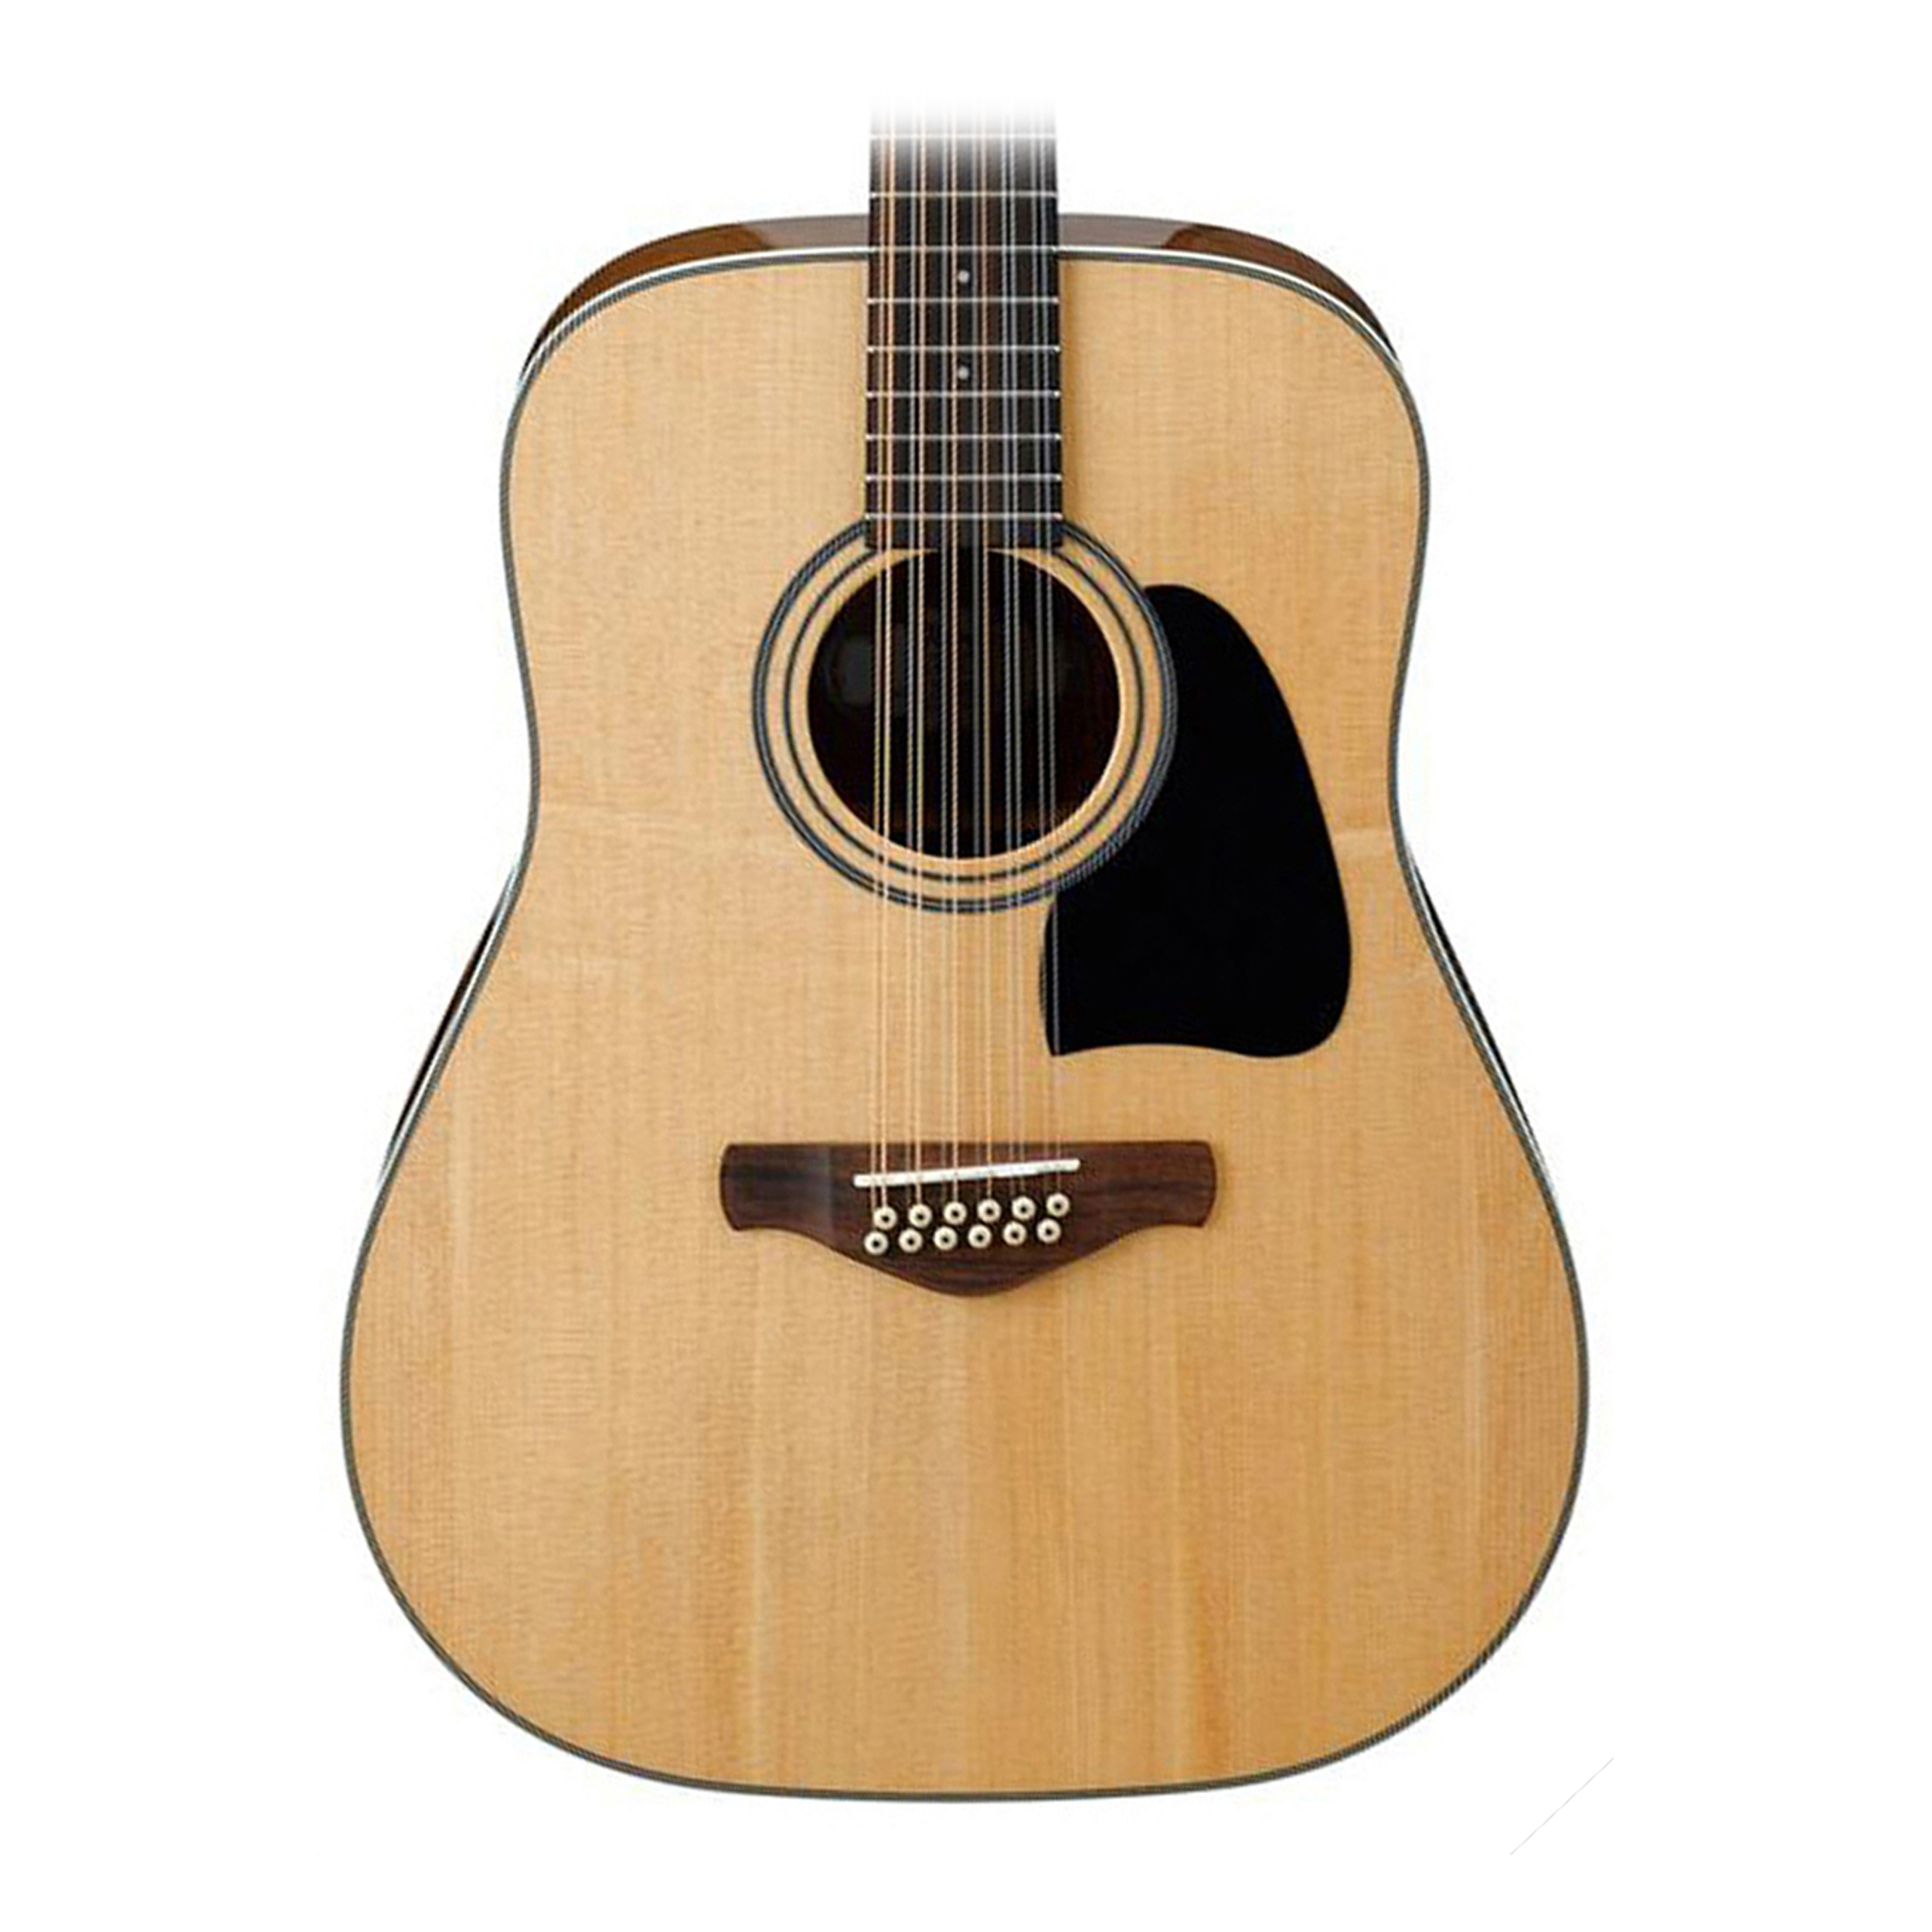 ibanez aw8012nt artwood 12 string acoustic guitar natu. Black Bedroom Furniture Sets. Home Design Ideas